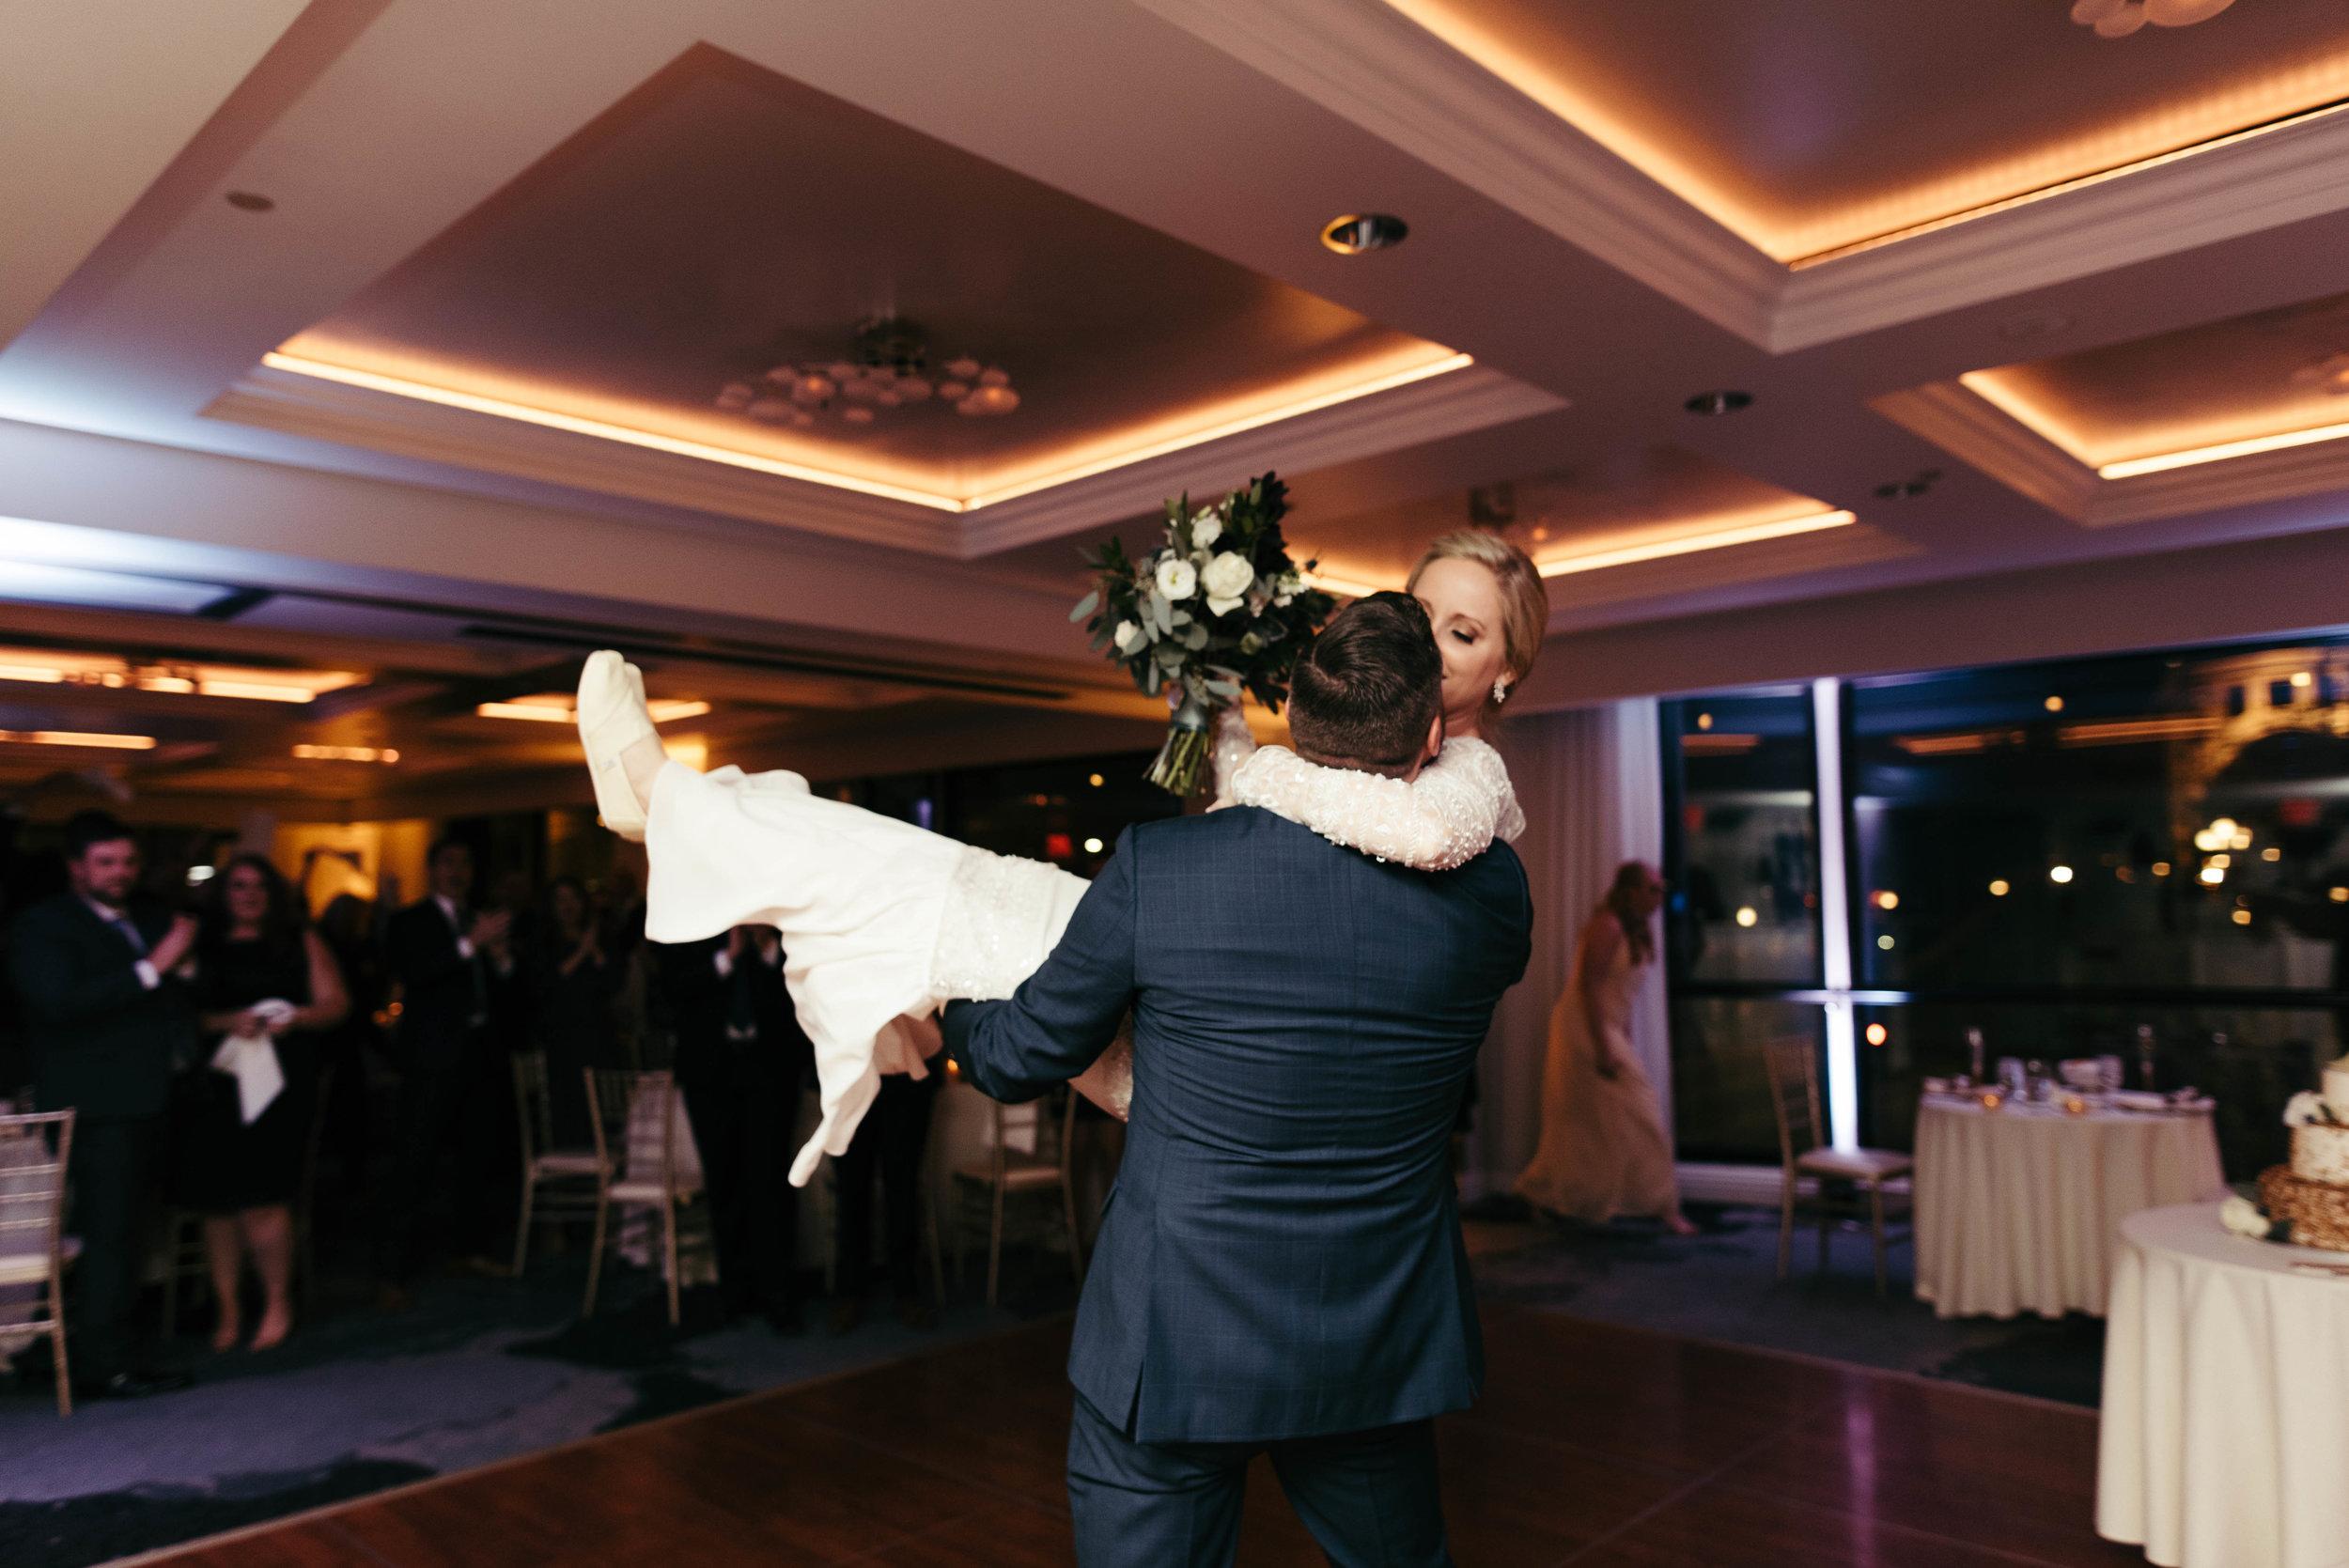 renaissance hotel wedding photos-45.jpg